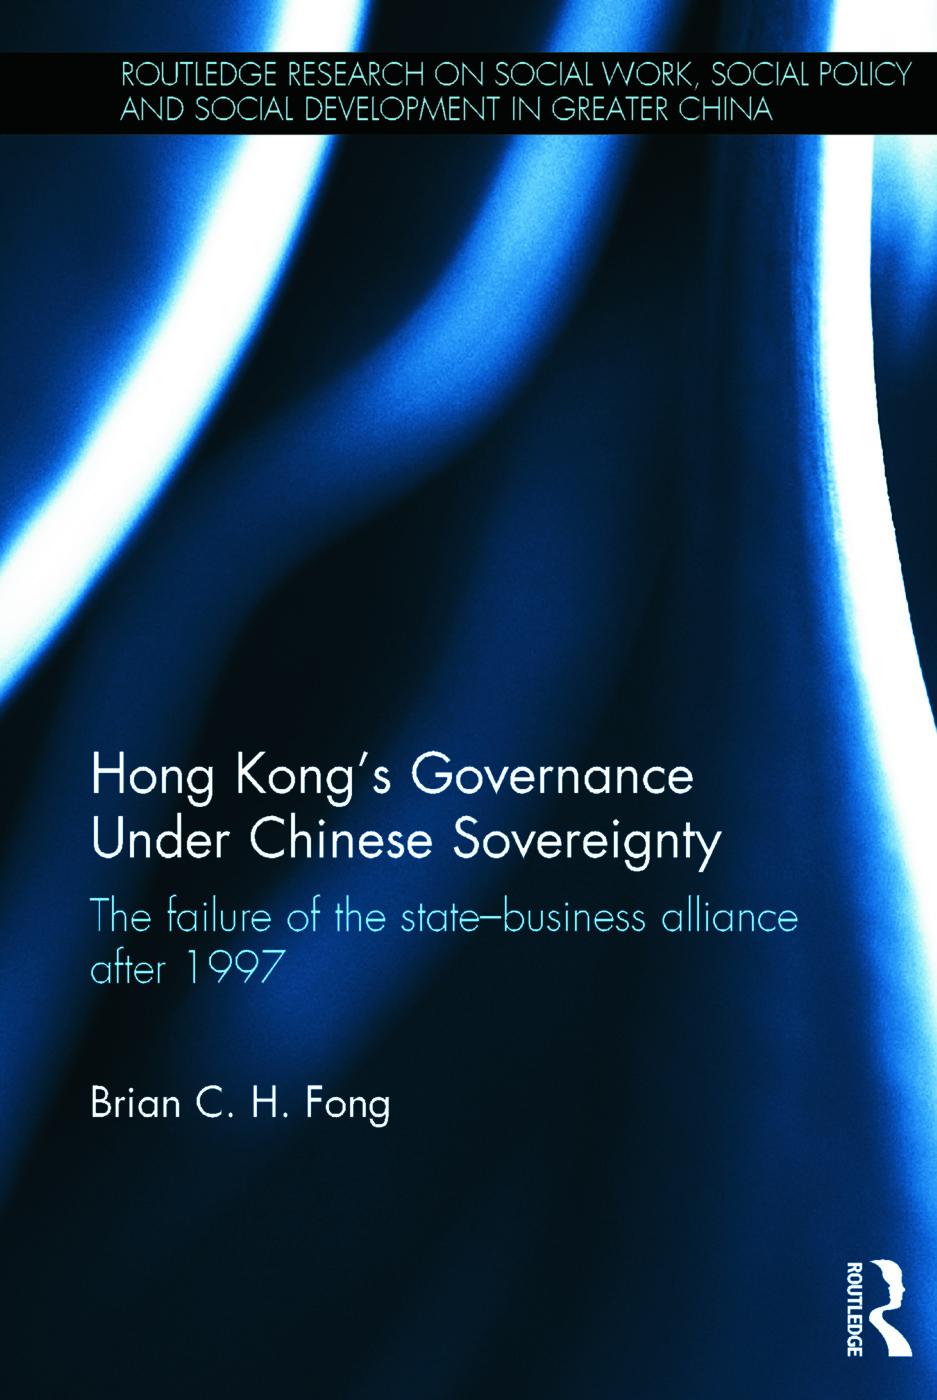 Hong Kong's Governance Under Chinese Sovereignty